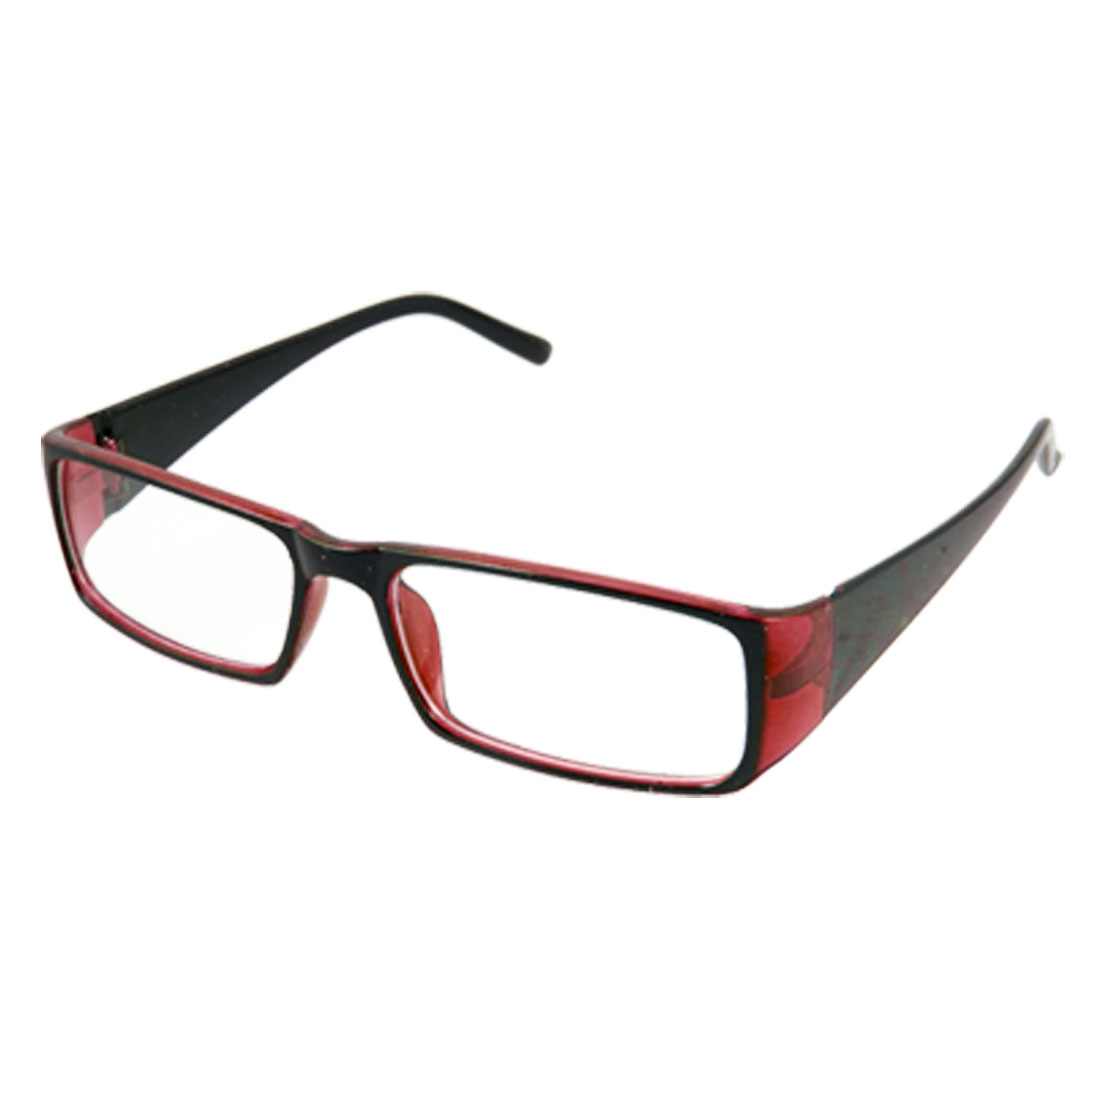 6a71fd58a2 Optical   Vision Centre